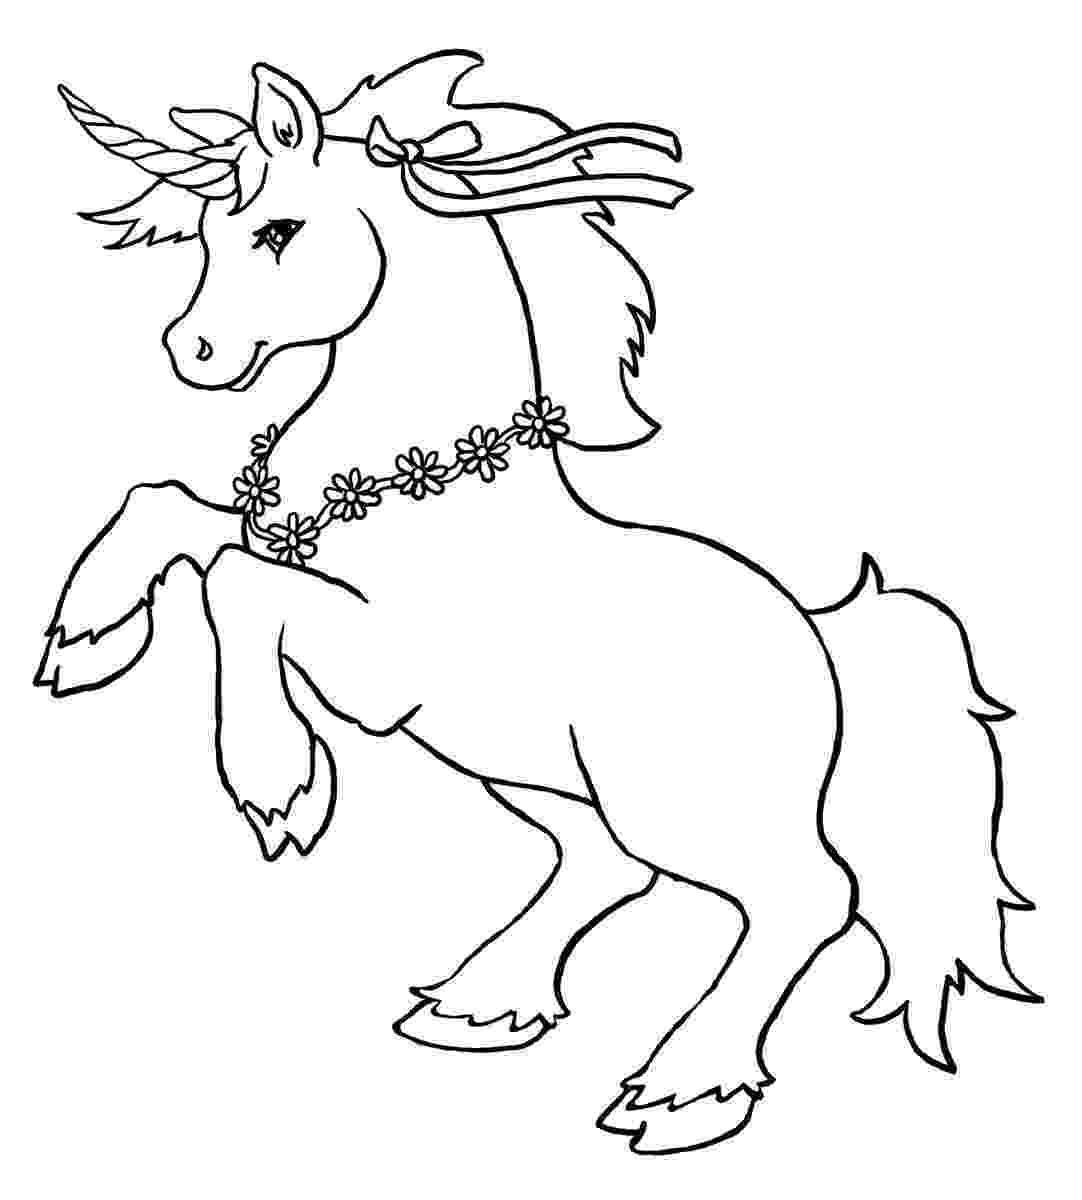 unicorn printable coloring pages fairy unicorn unicorns adult coloring pages printable pages coloring unicorn